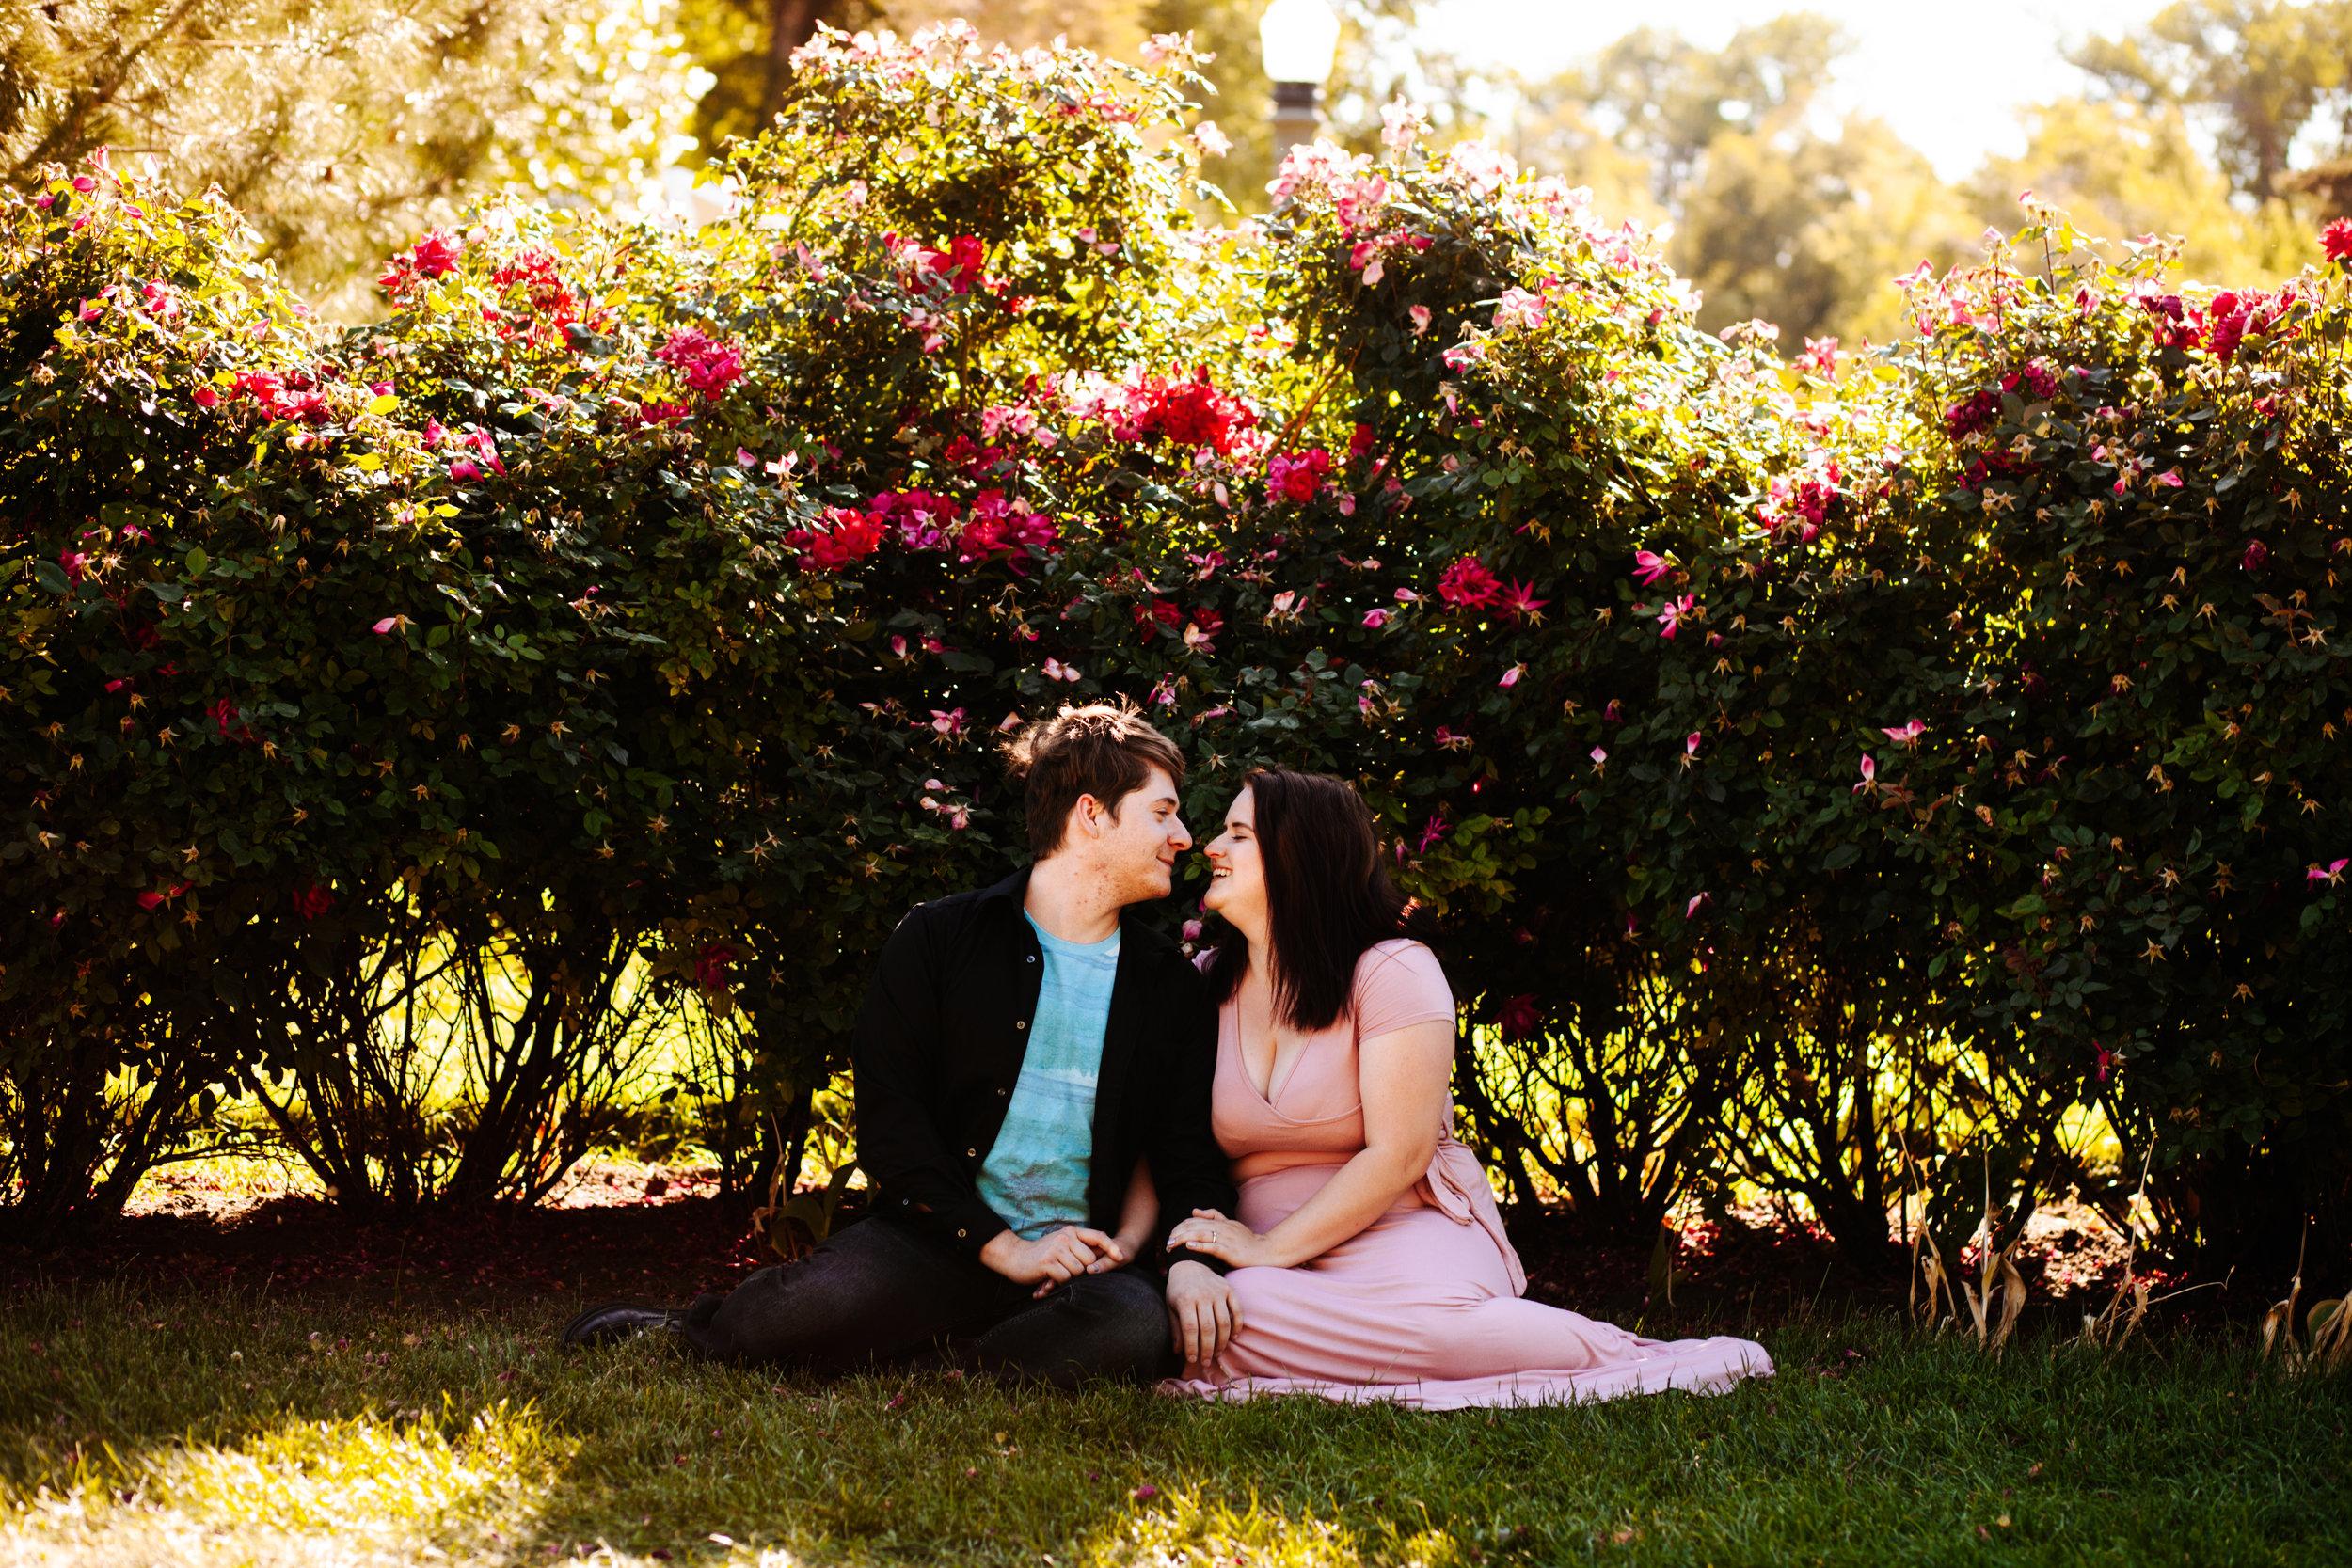 +Liberty Park +Utah Engagement Session +Salt Lake City Engagement Photographer +Utah Wedding Photographer +Marina Rey Photo-9632.jpg